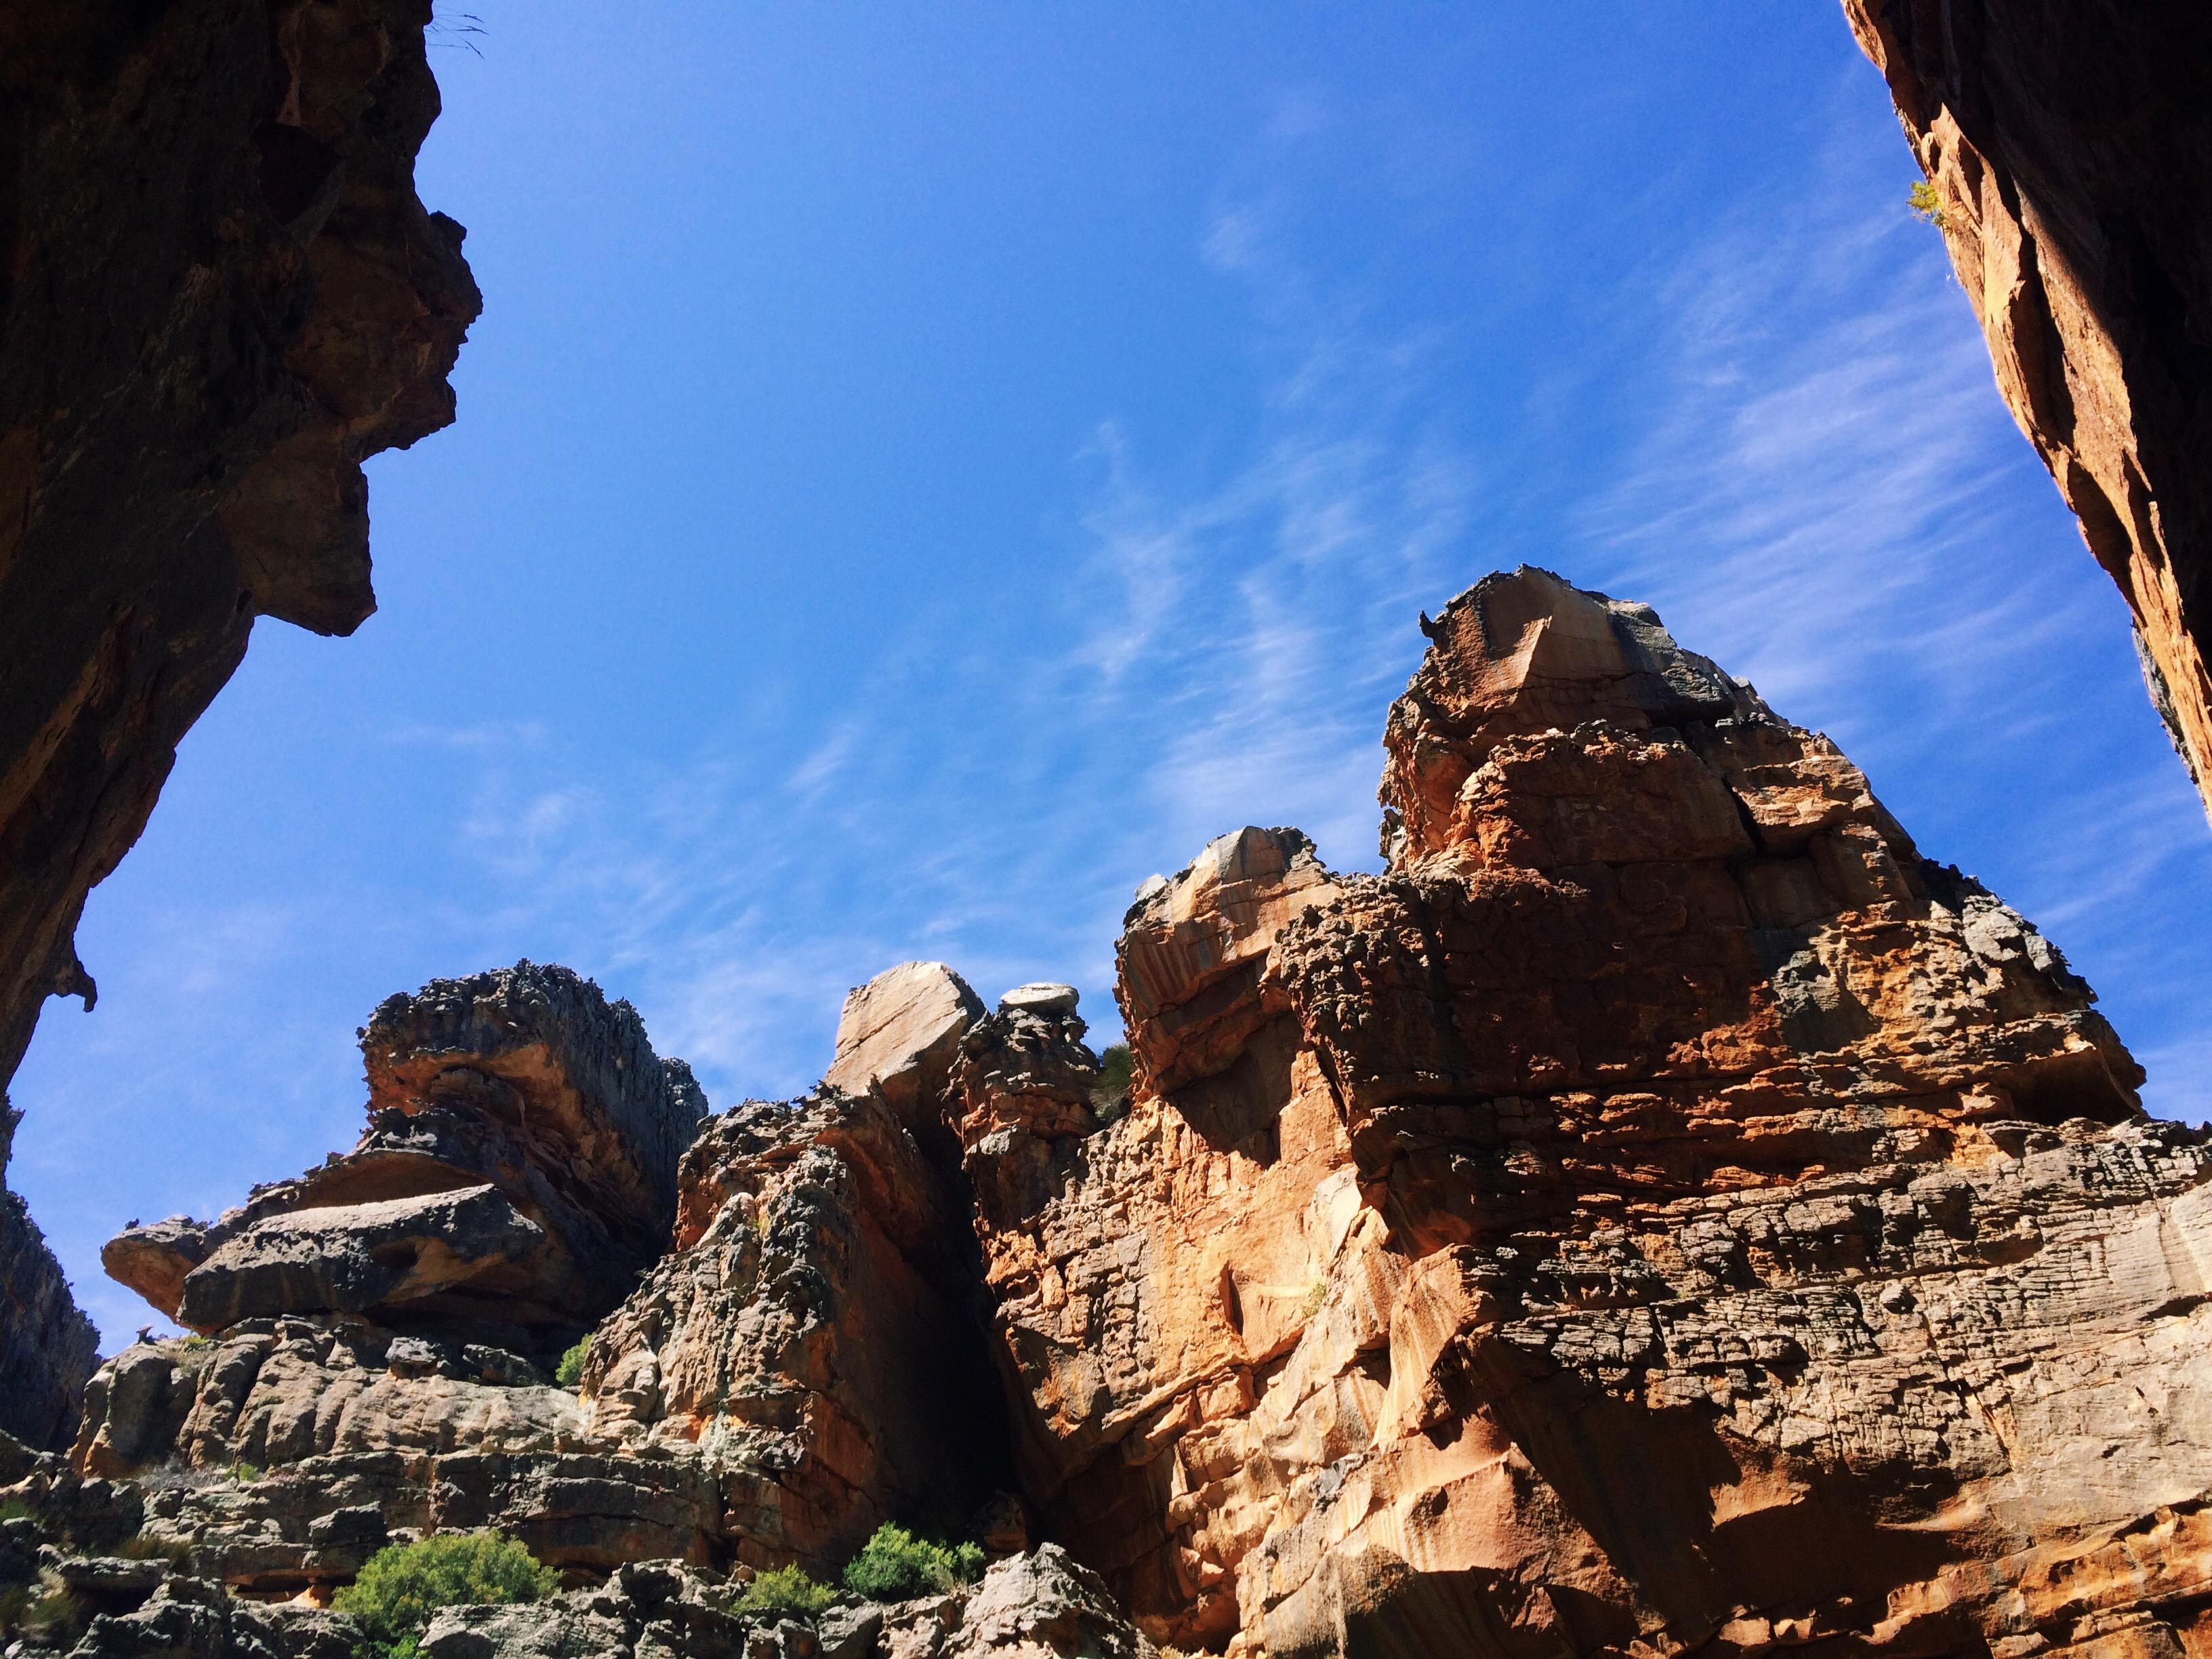 Sandstone formations - Wolfberg Cracks, Cederberg